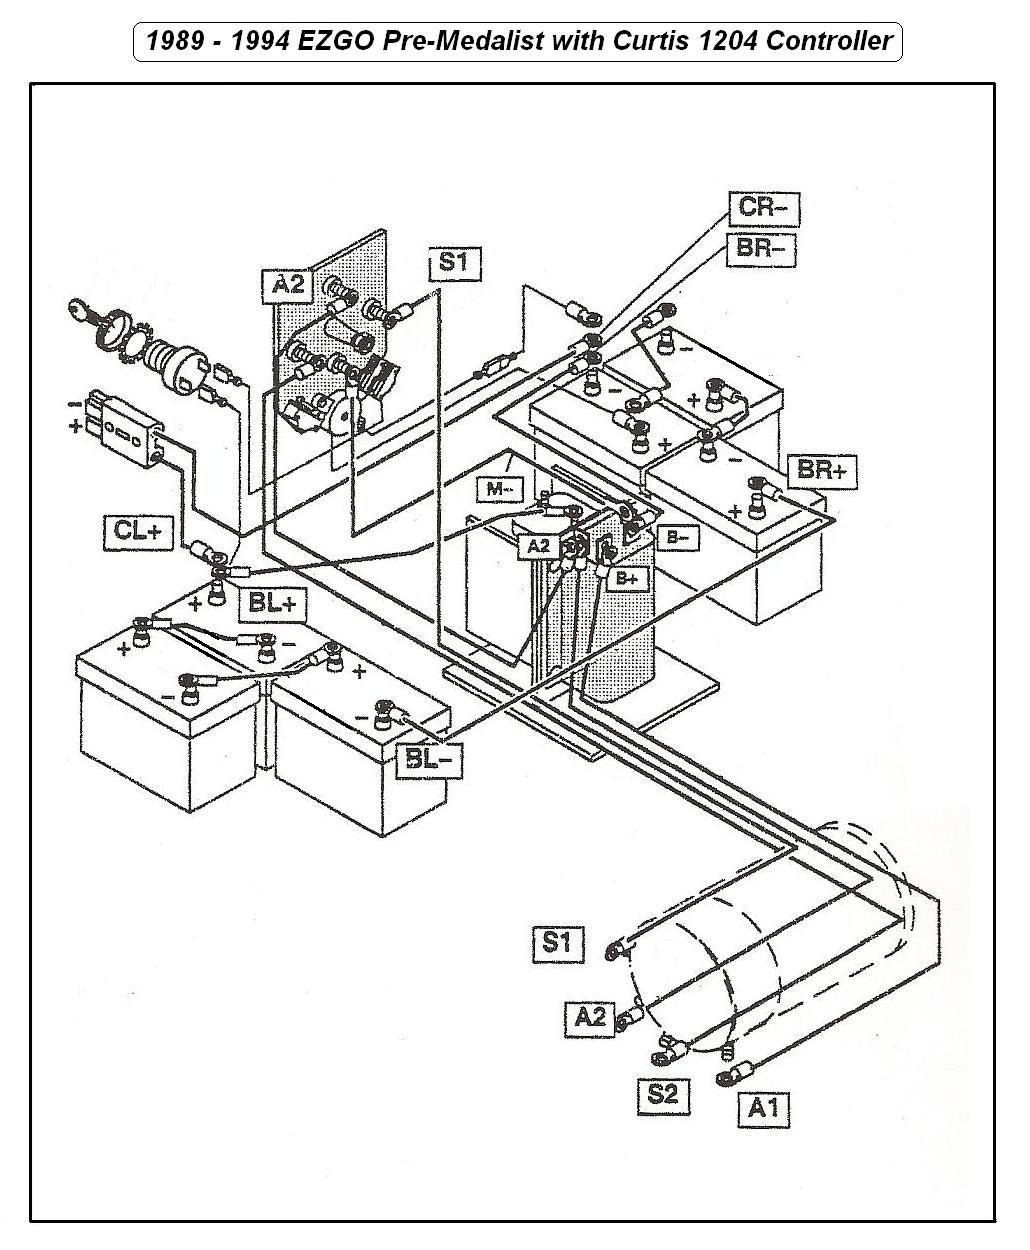 36 Volt Ezgo Golf Cart Wiring Diagram from annawiringdiagram.com